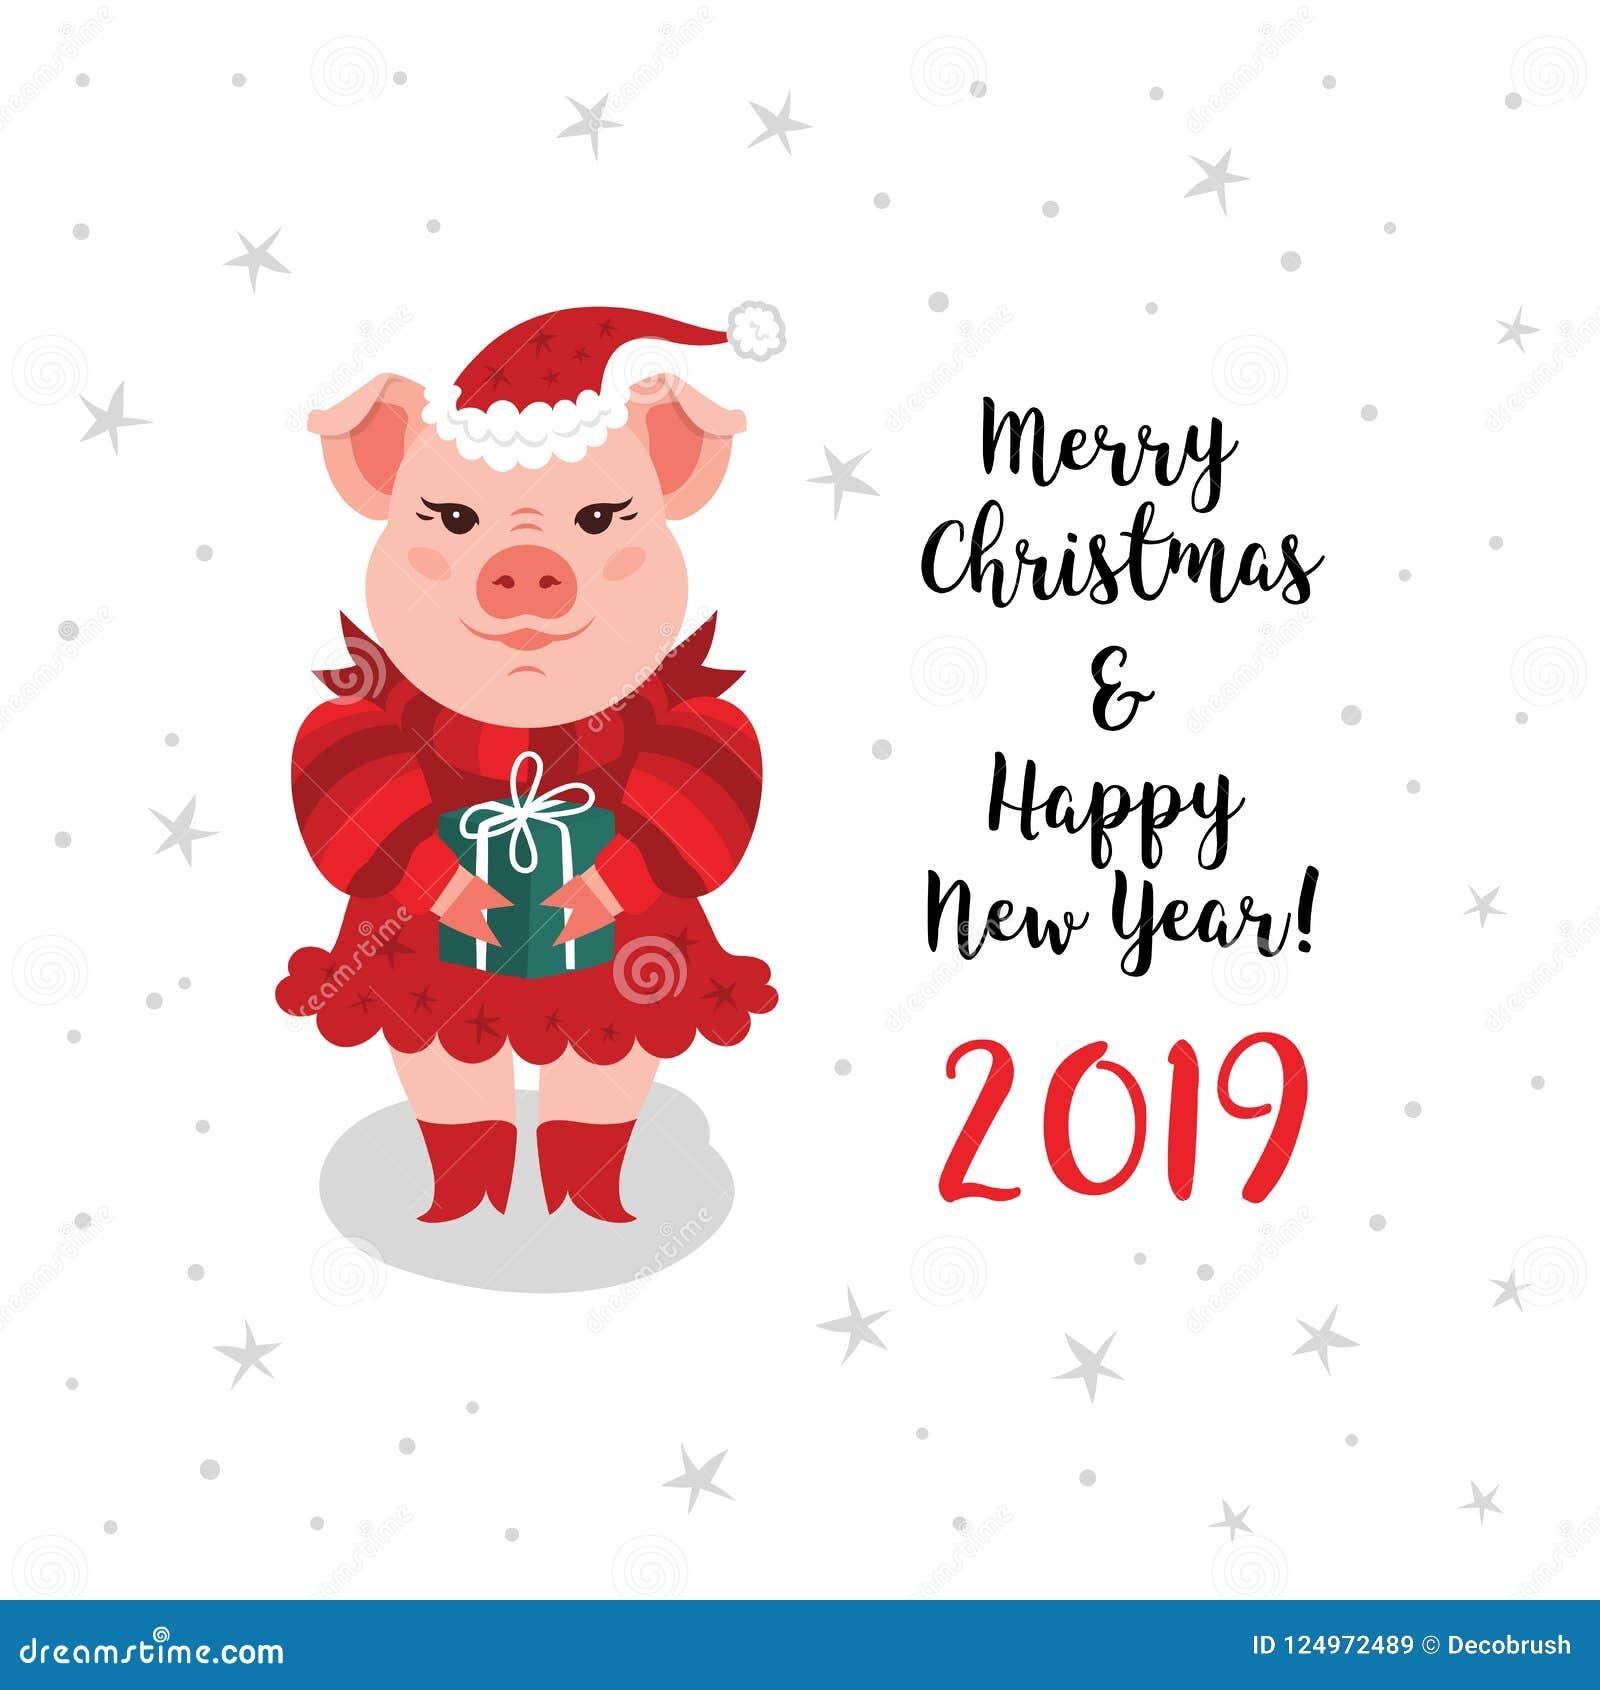 christmas pig greeting card merry christmas happy new year 2019 card a cartoon pig